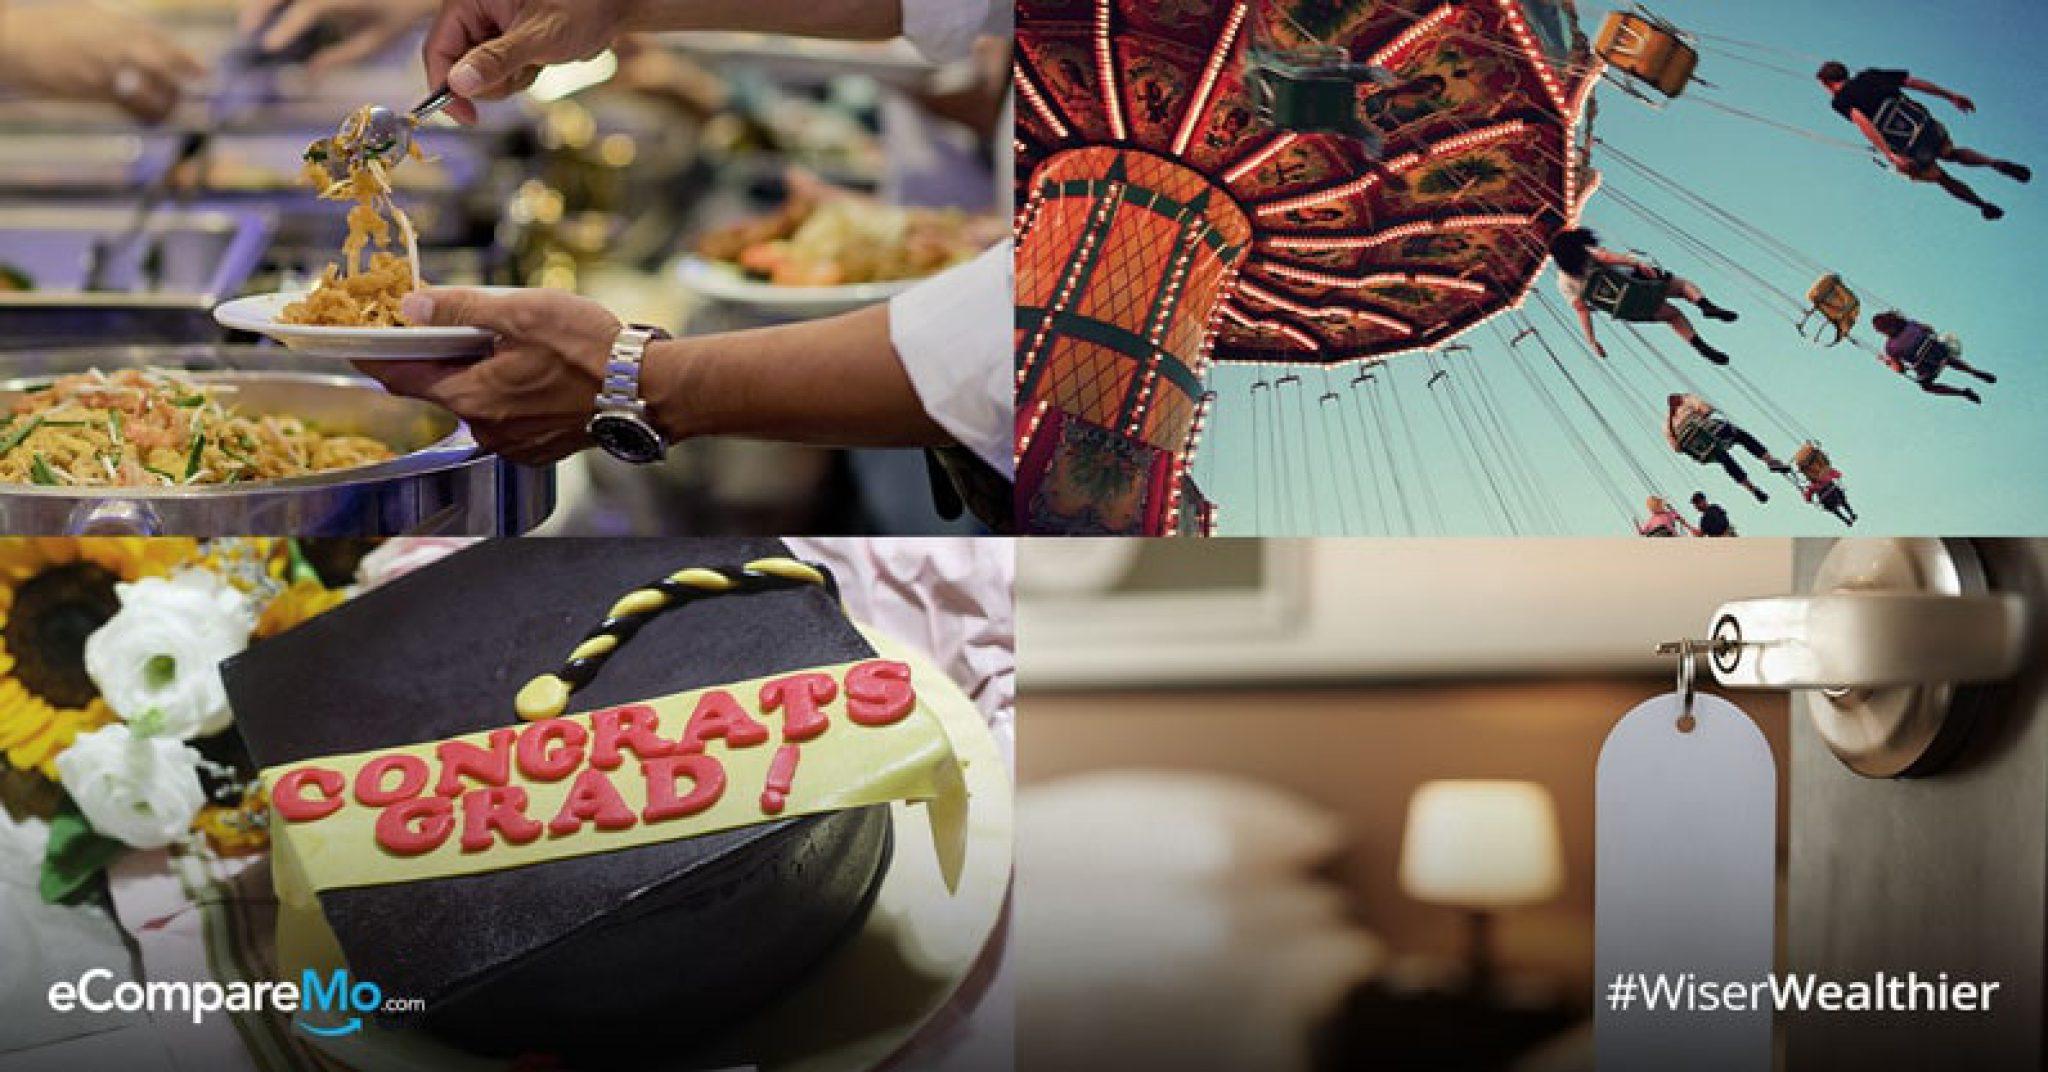 Graduation Promos 2019: 30 Hotel, Buffet, and Restaurant Discounts